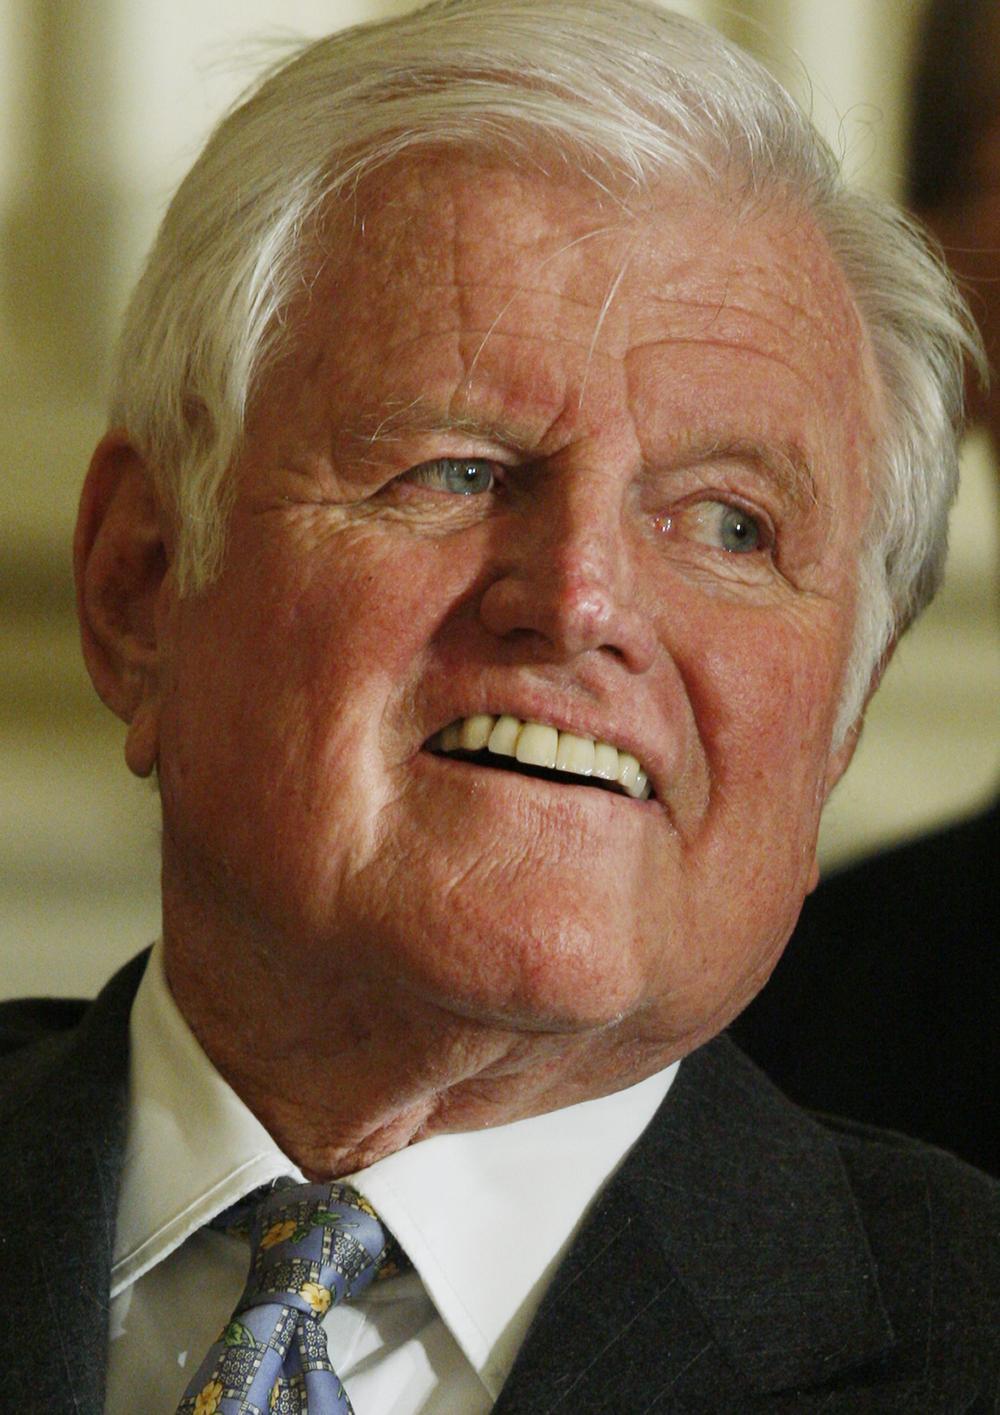 Kennedy Returns